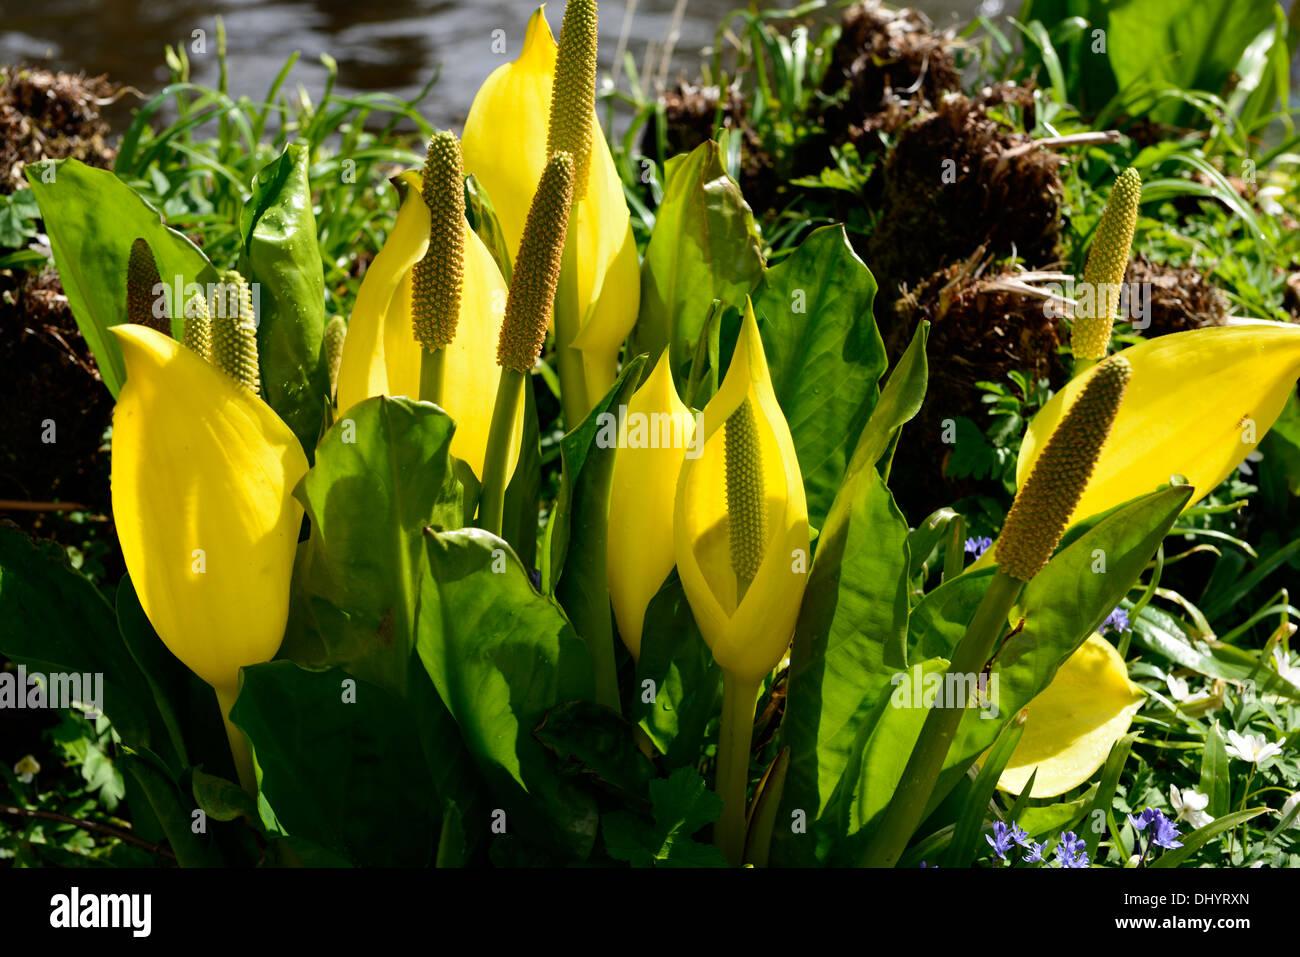 Lysichiton Americanus gelb Skunk Cabbage Blumen Blte